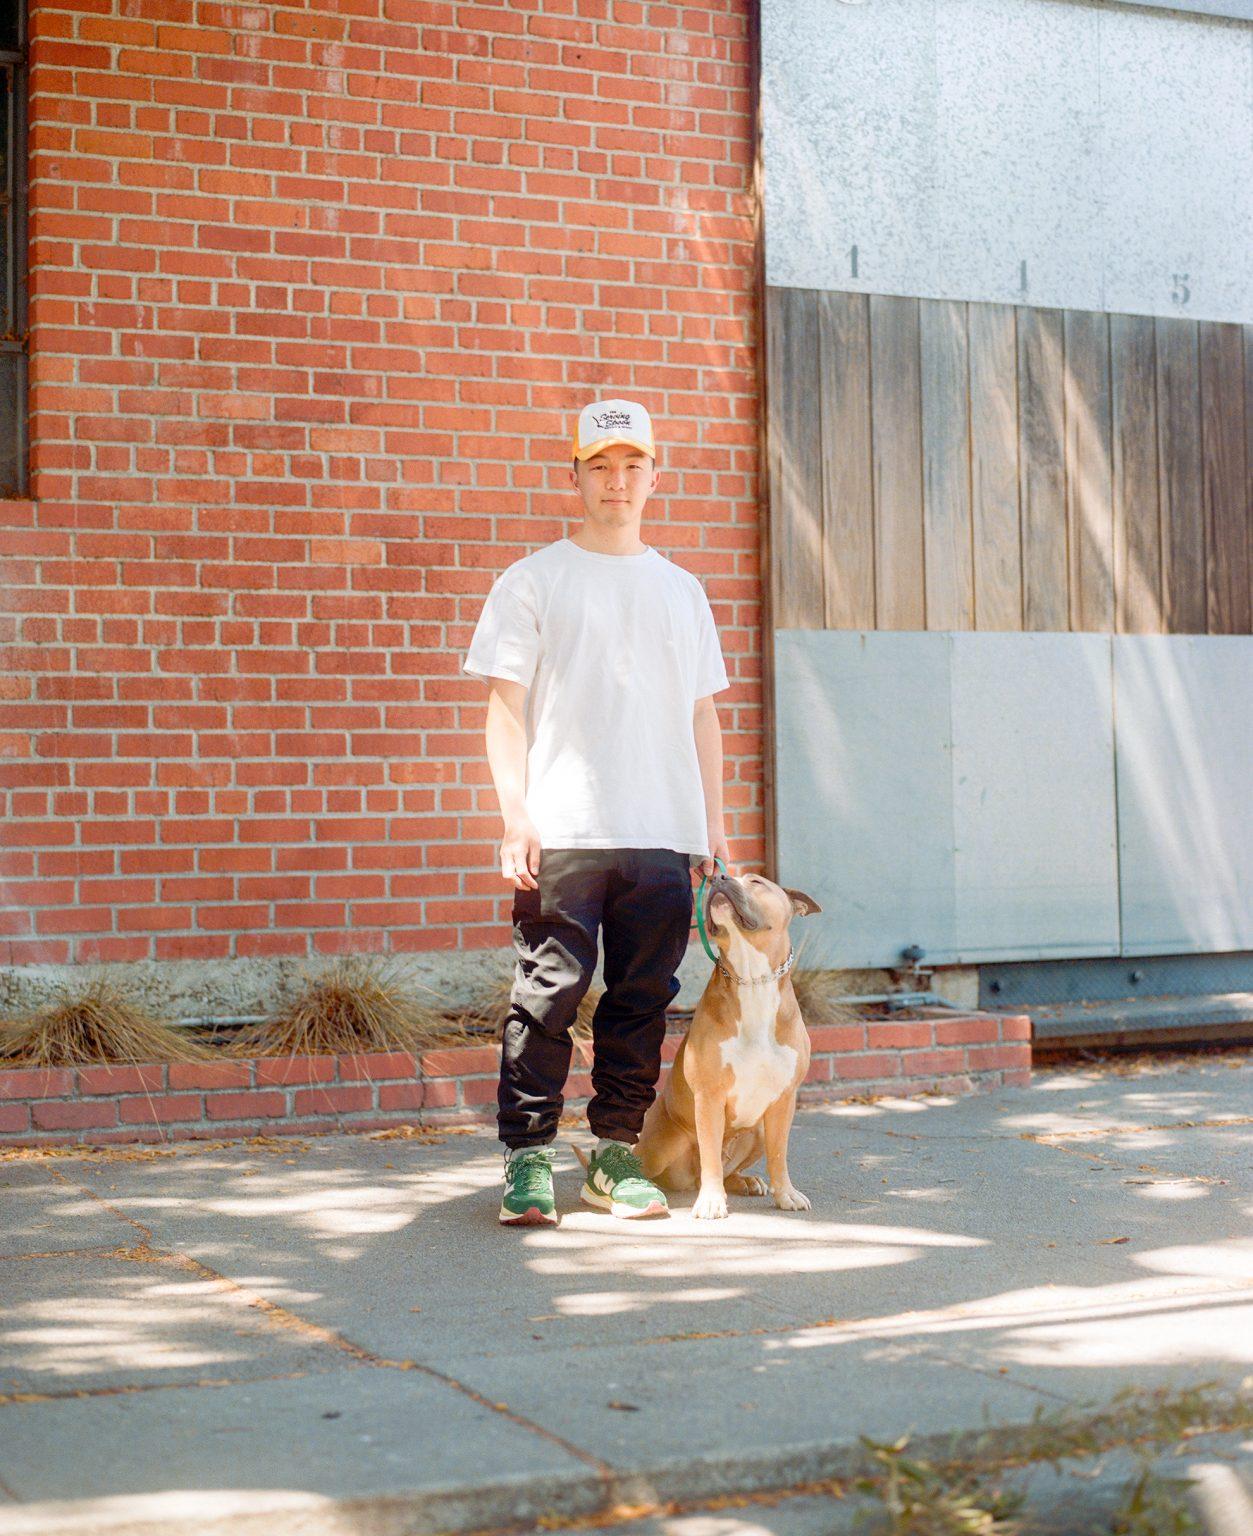 Kevin Wong standing next to his dog Chibi on a sun dappled sidewalk